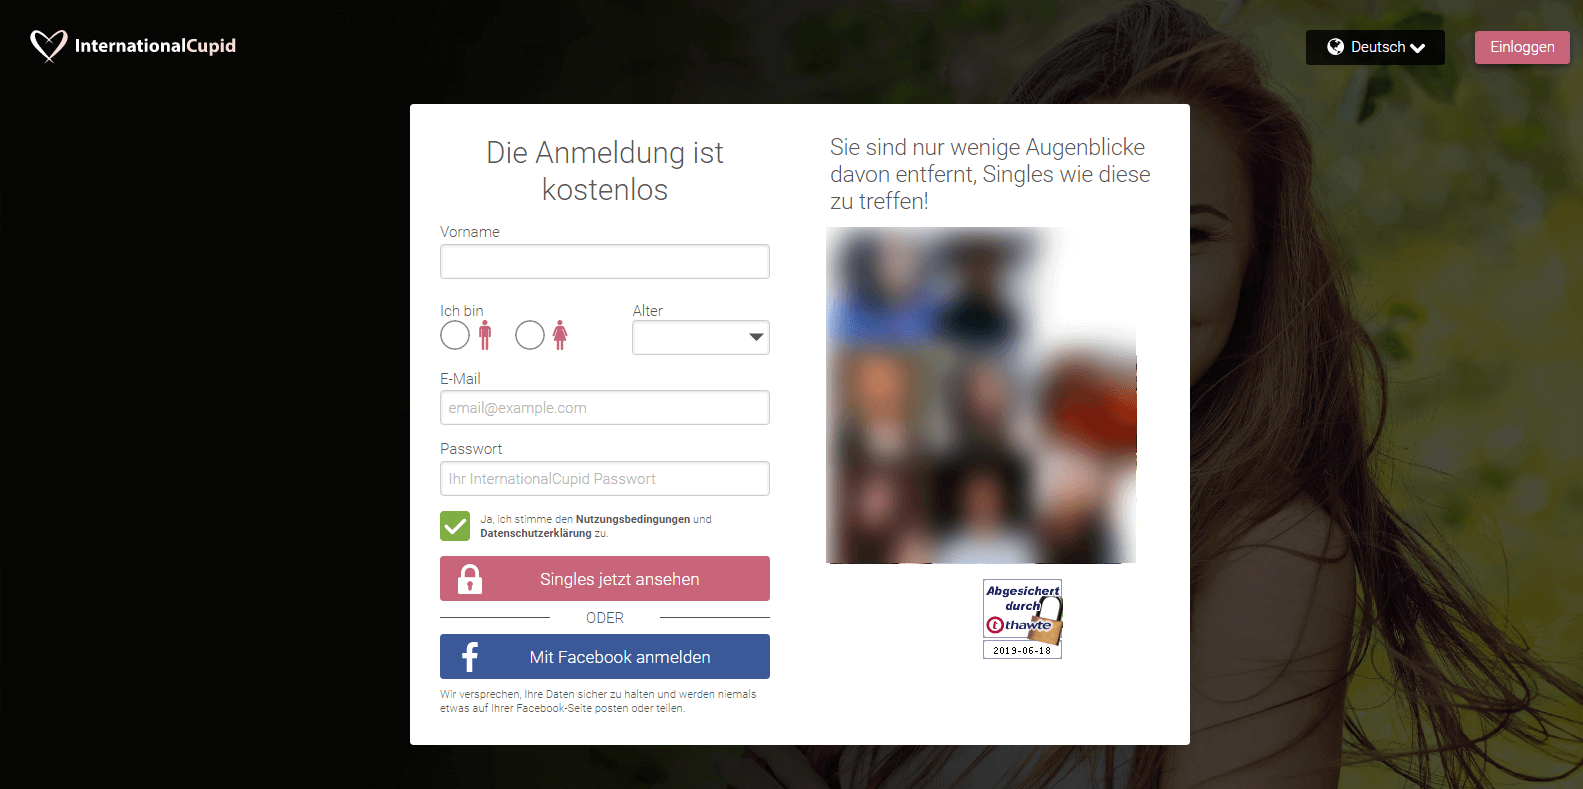 InternationalCupid Anmeldung